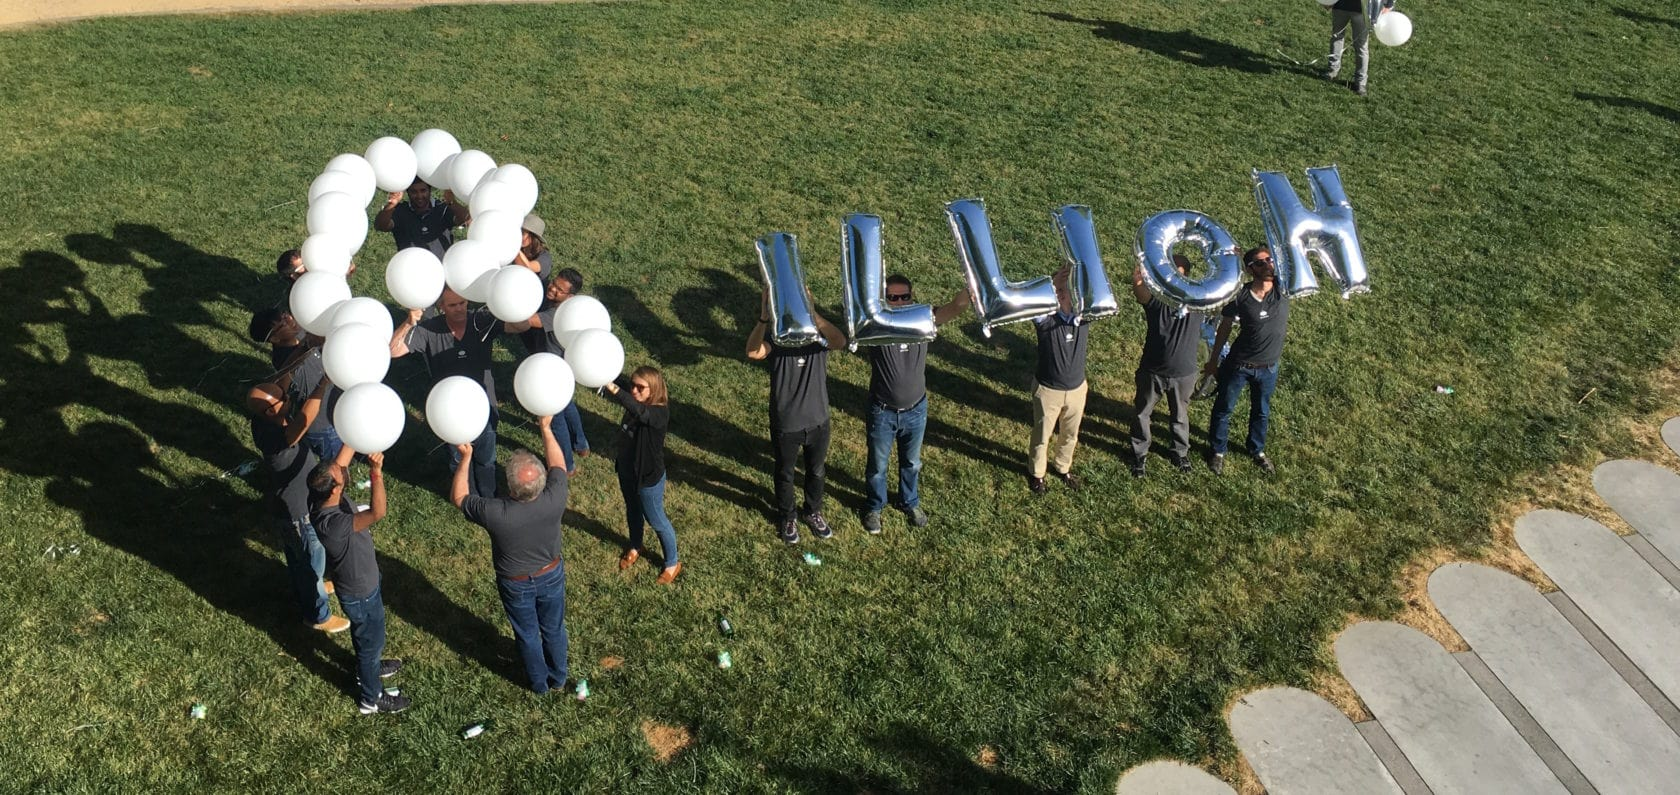 The story of 15B miles, a dozen balloons, & tree climbing